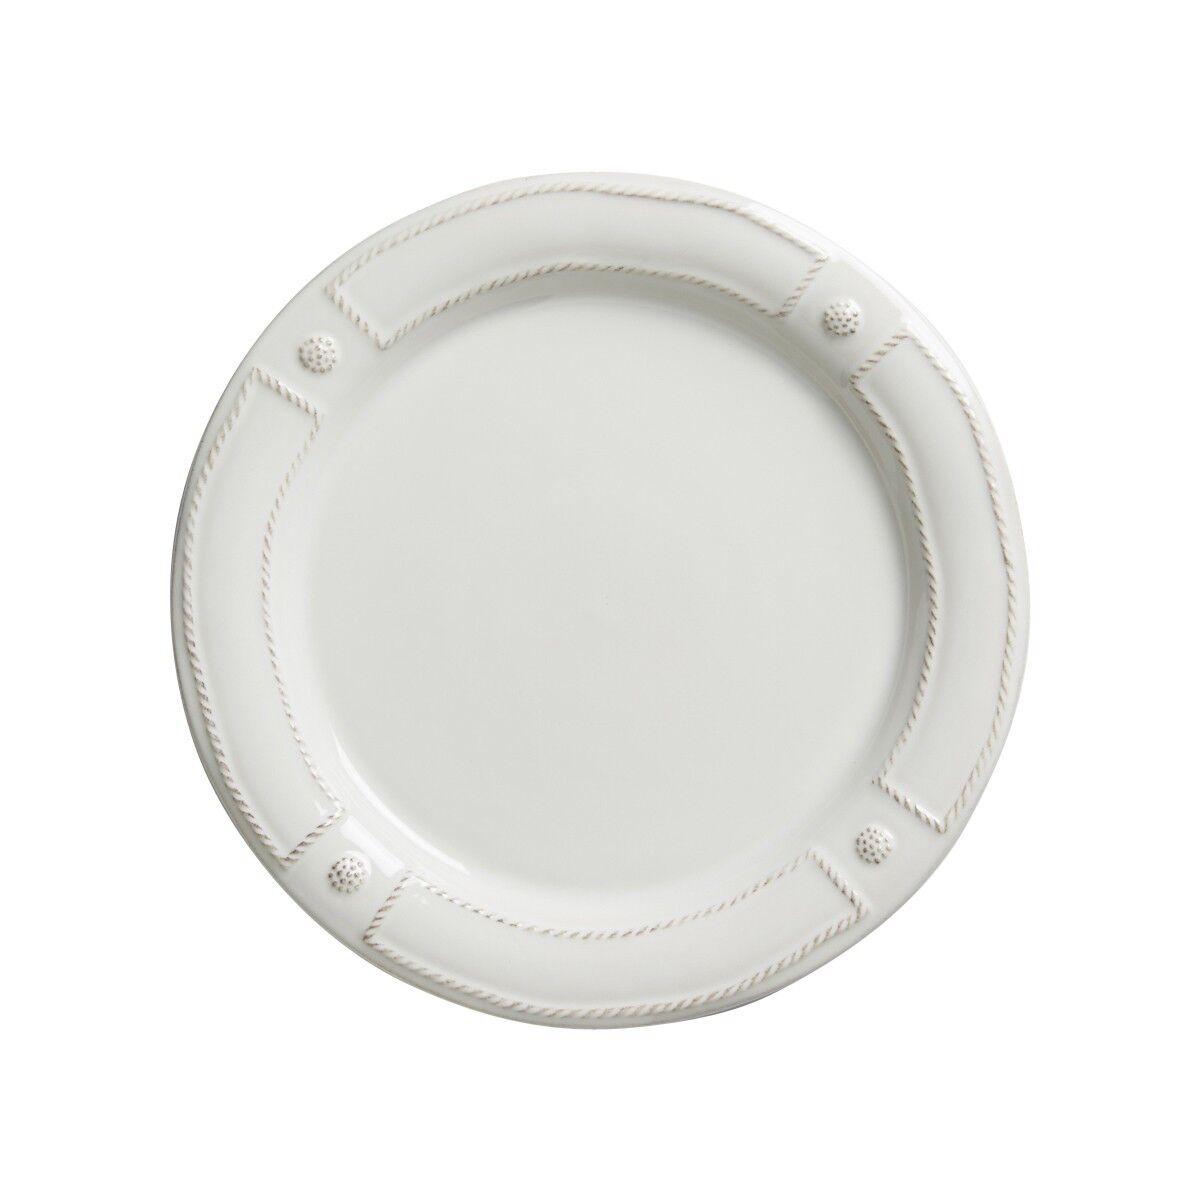 Juliska Berry & Thread French Panel blancwash Dinner Plate - Set of 4